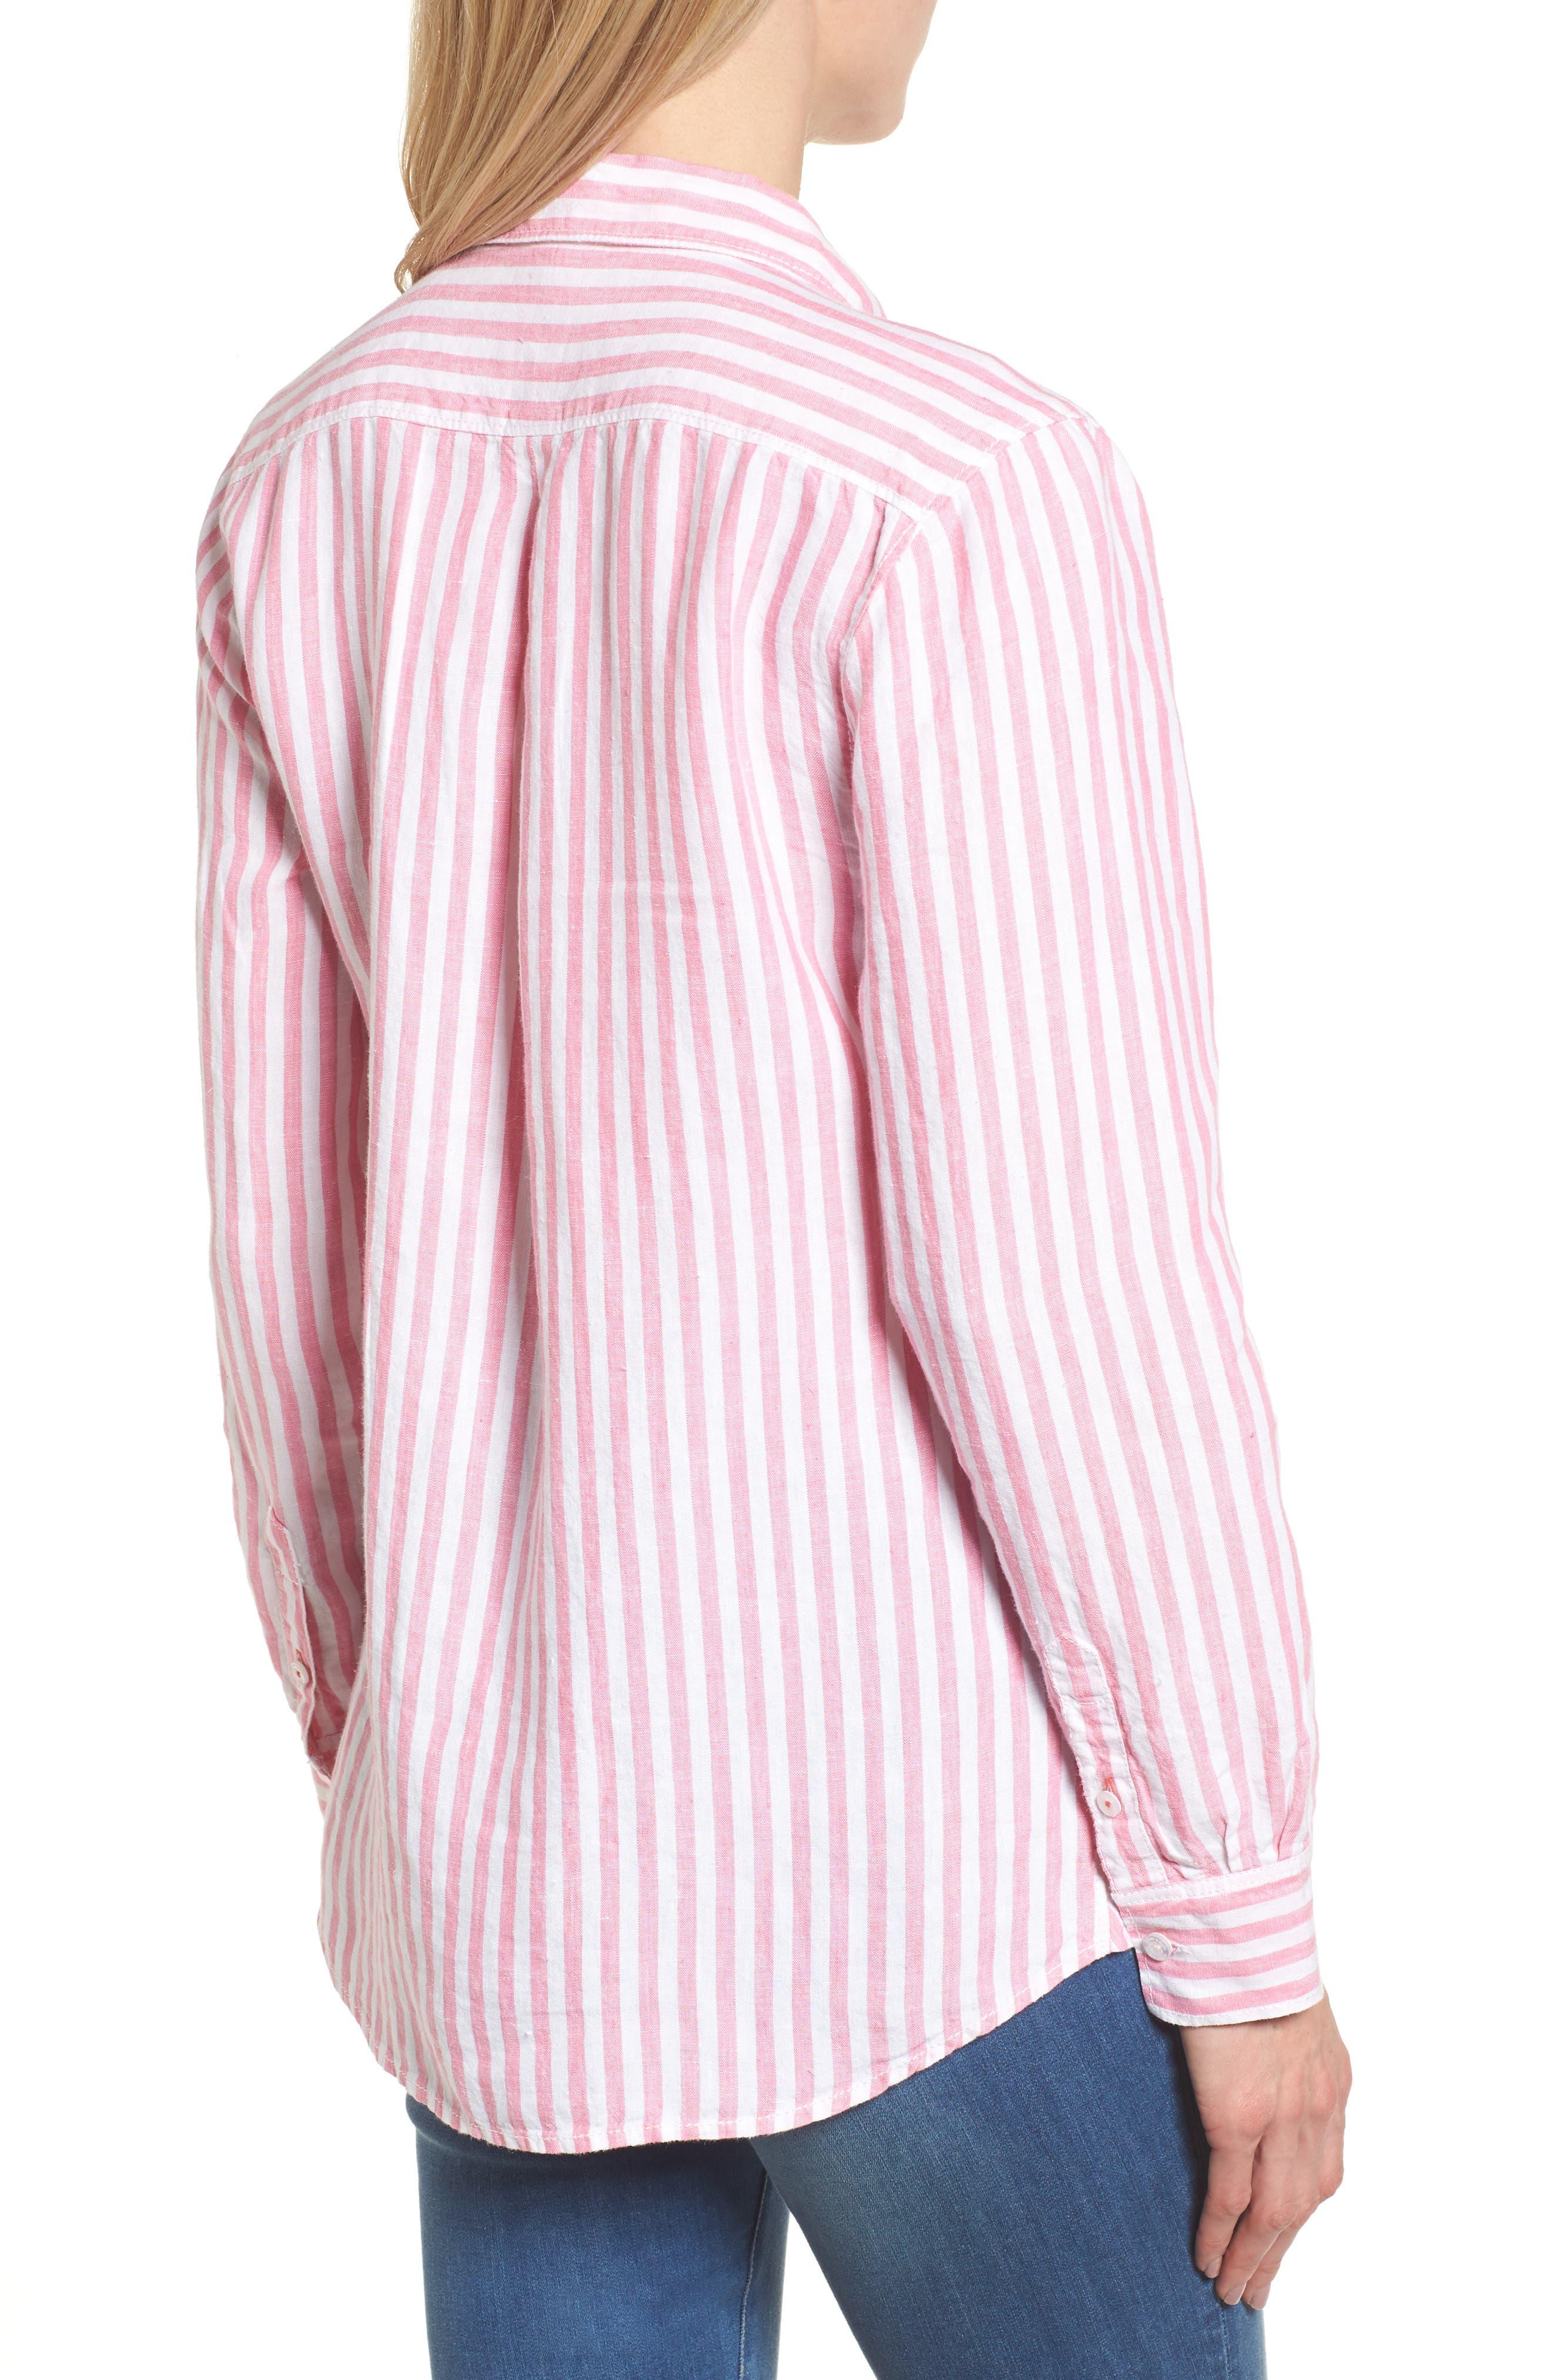 Cabana Stripe Button-Up Top,                             Alternate thumbnail 2, color,                             Soft Flamingo